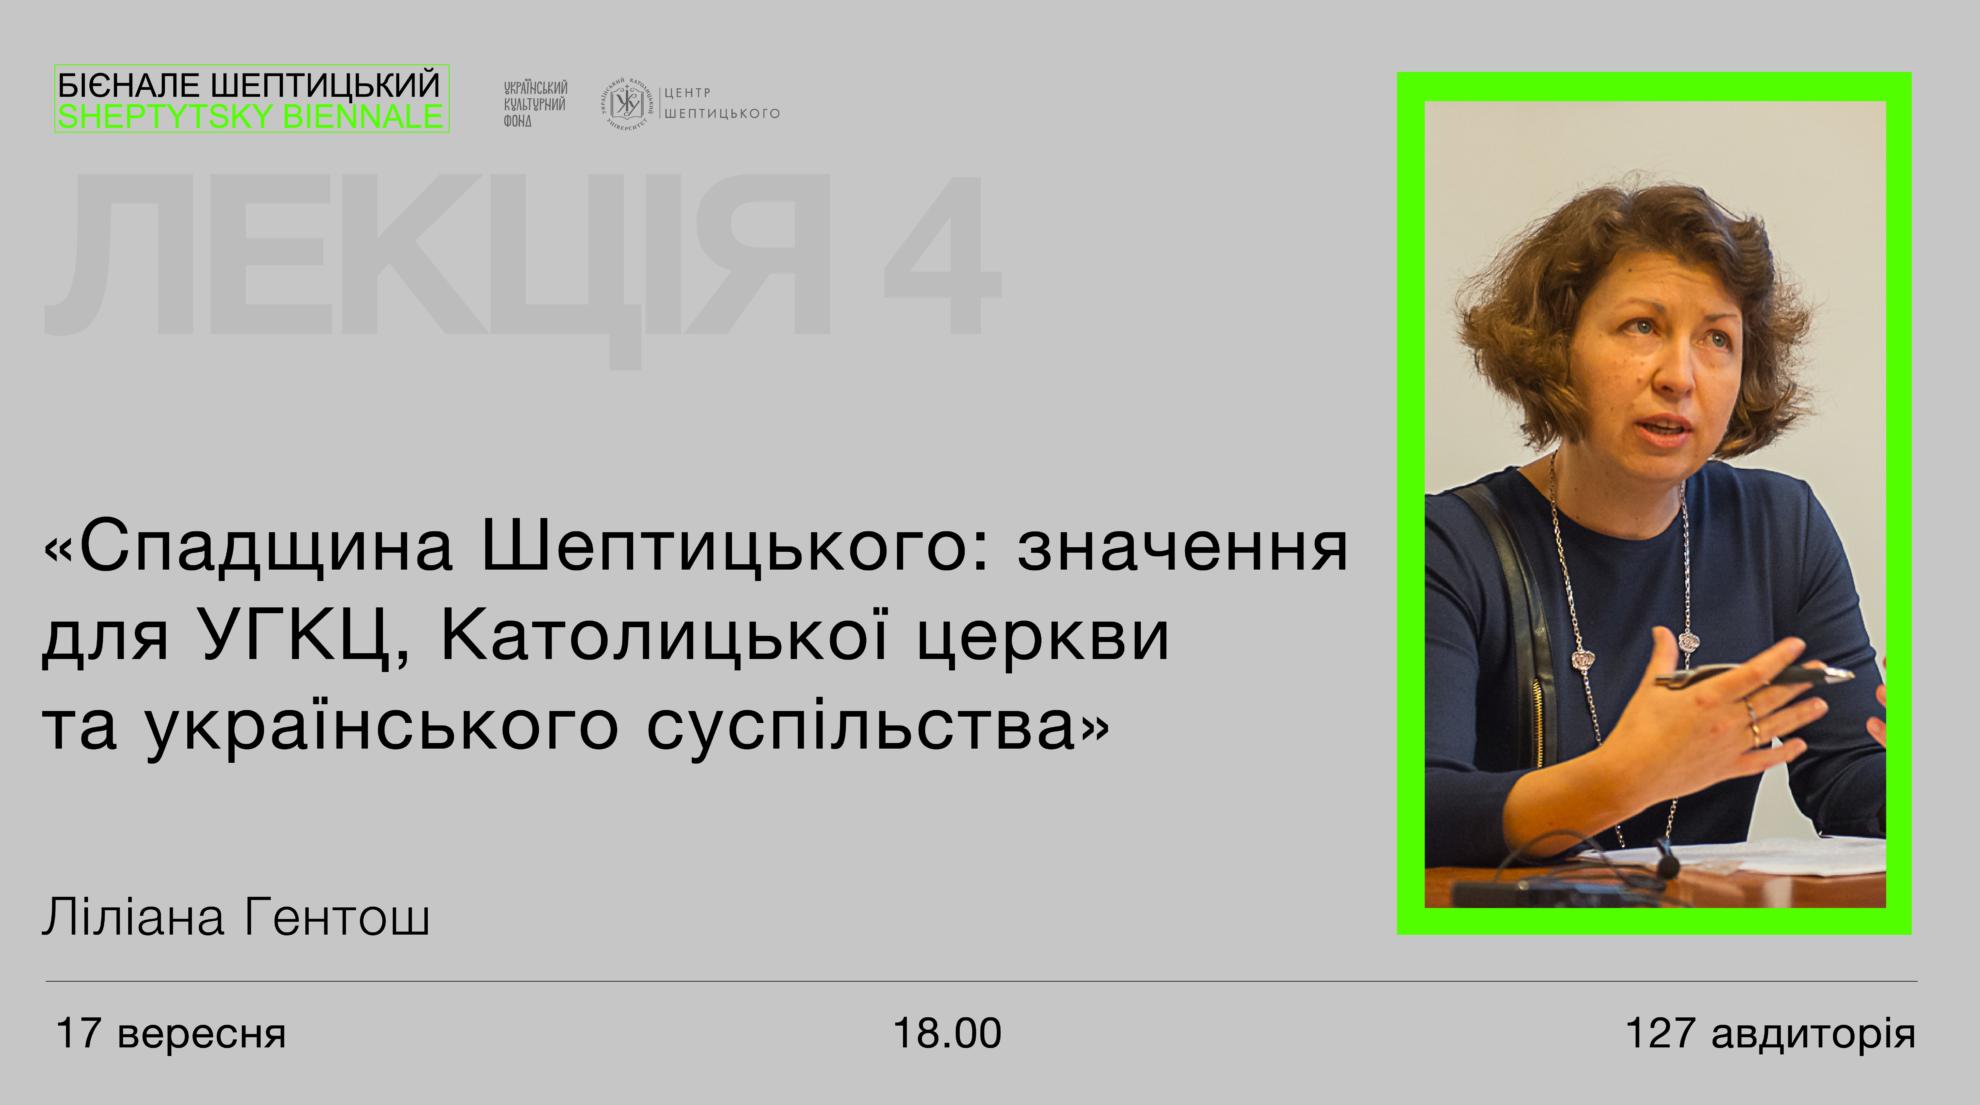 "Лекція Ліліани Гентош в рамках ""Бієнале Шептицький"""